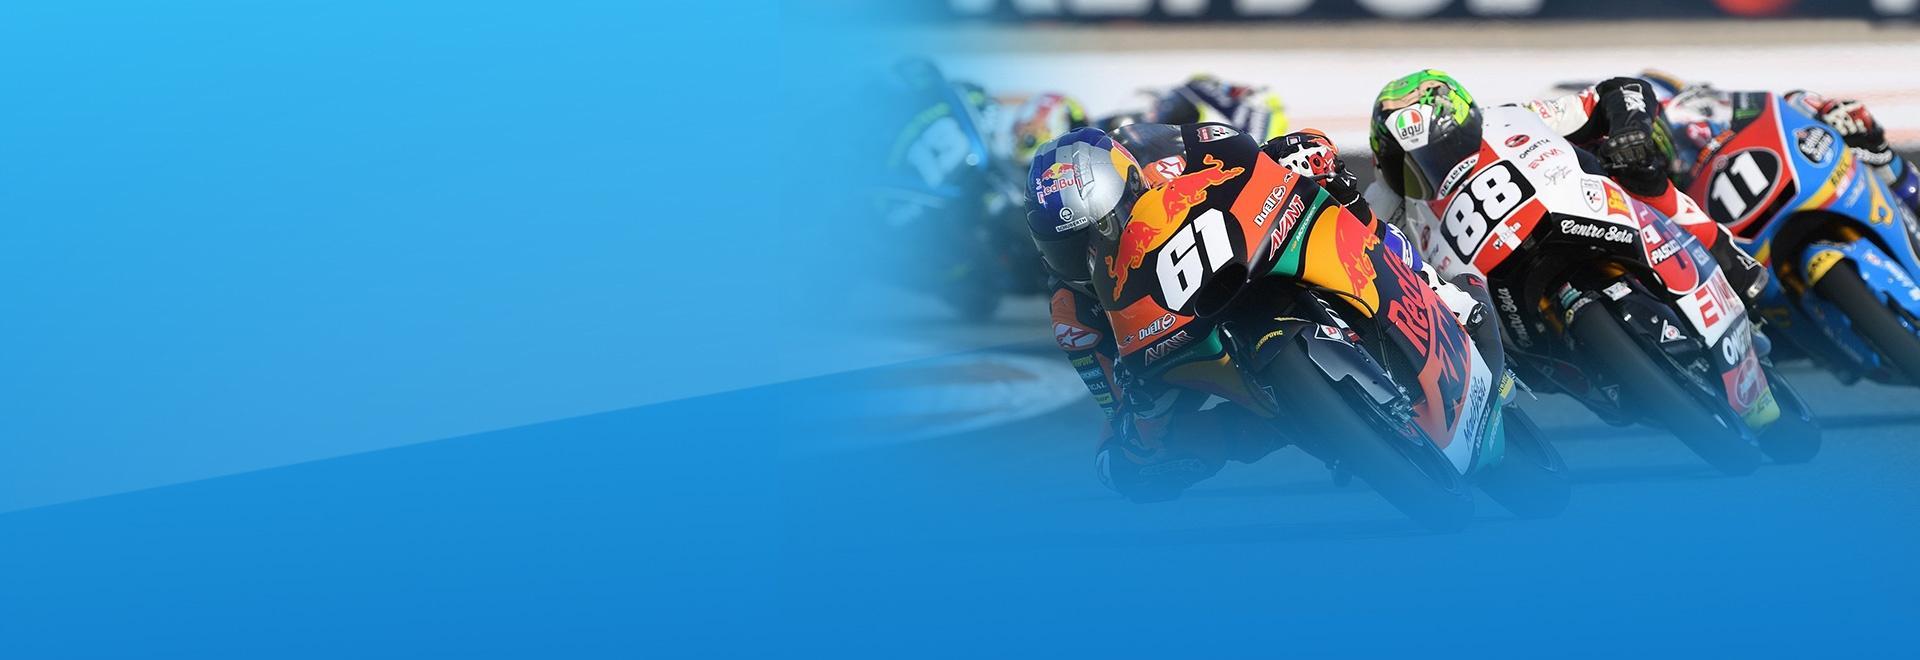 GP Catalunya: Moto2. Gara 2